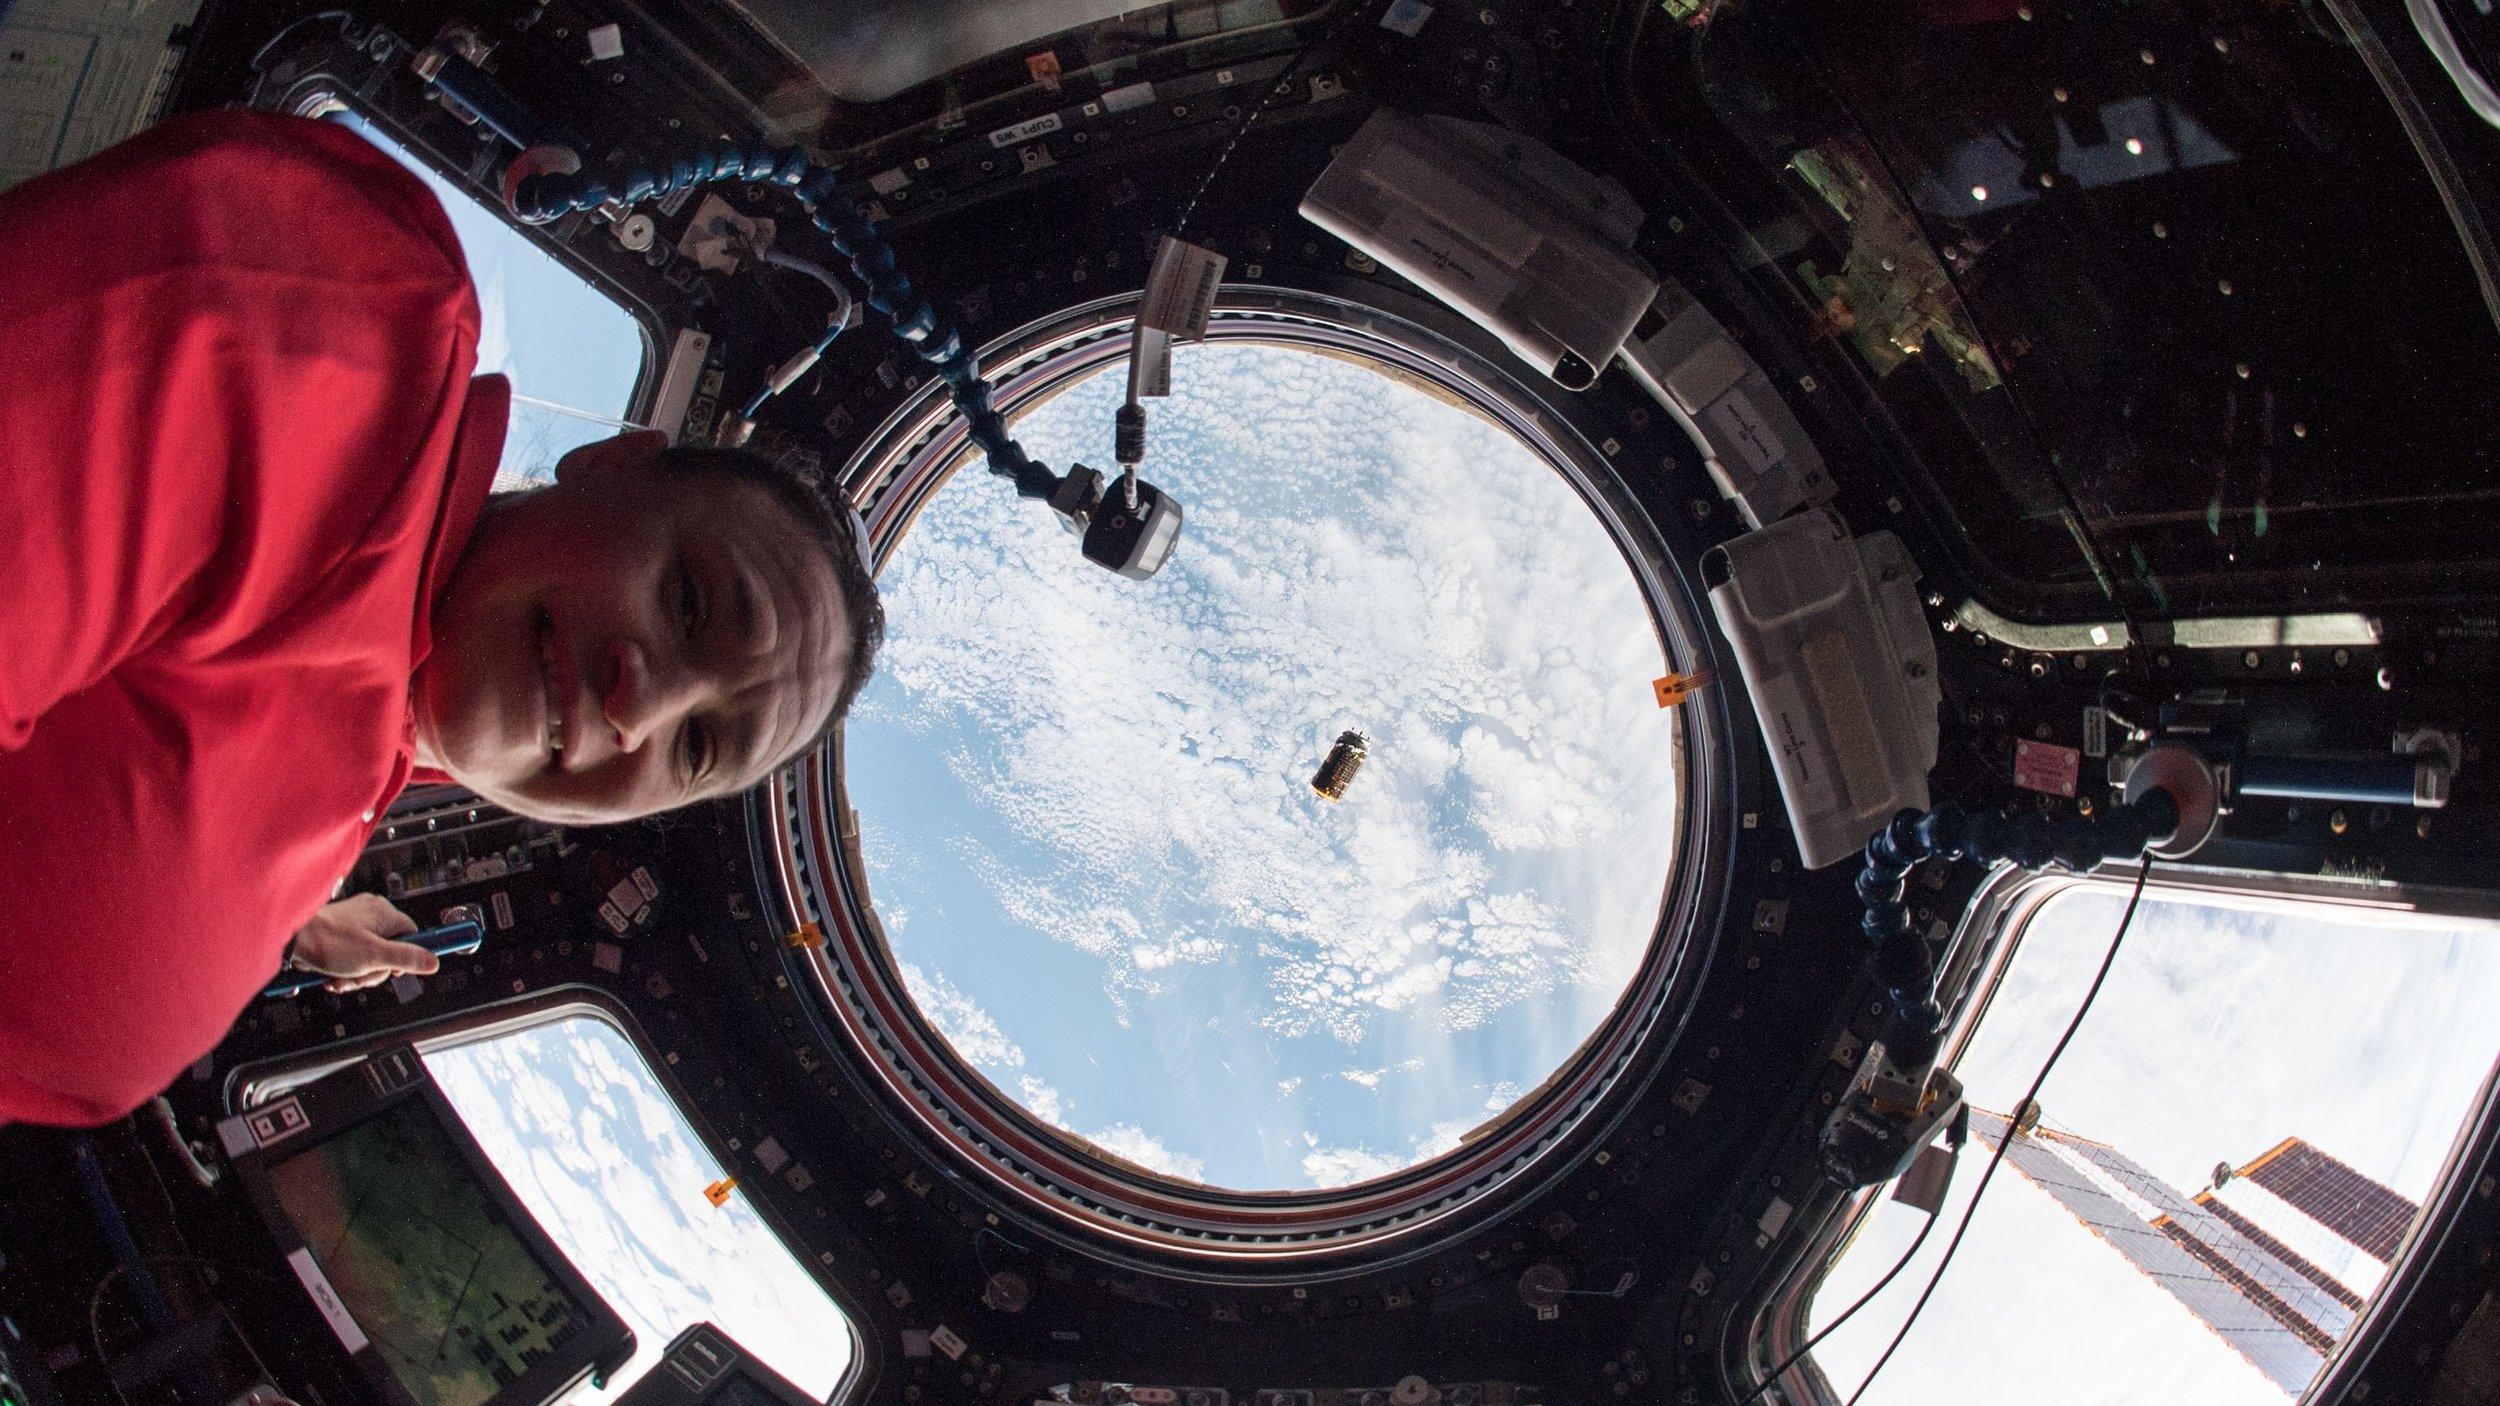 NASA astronaut Serena Aunon-Chancellor monitors the arrival of Kounotori 7 before it was captured Sept. 27, 2018. Credit: NASA